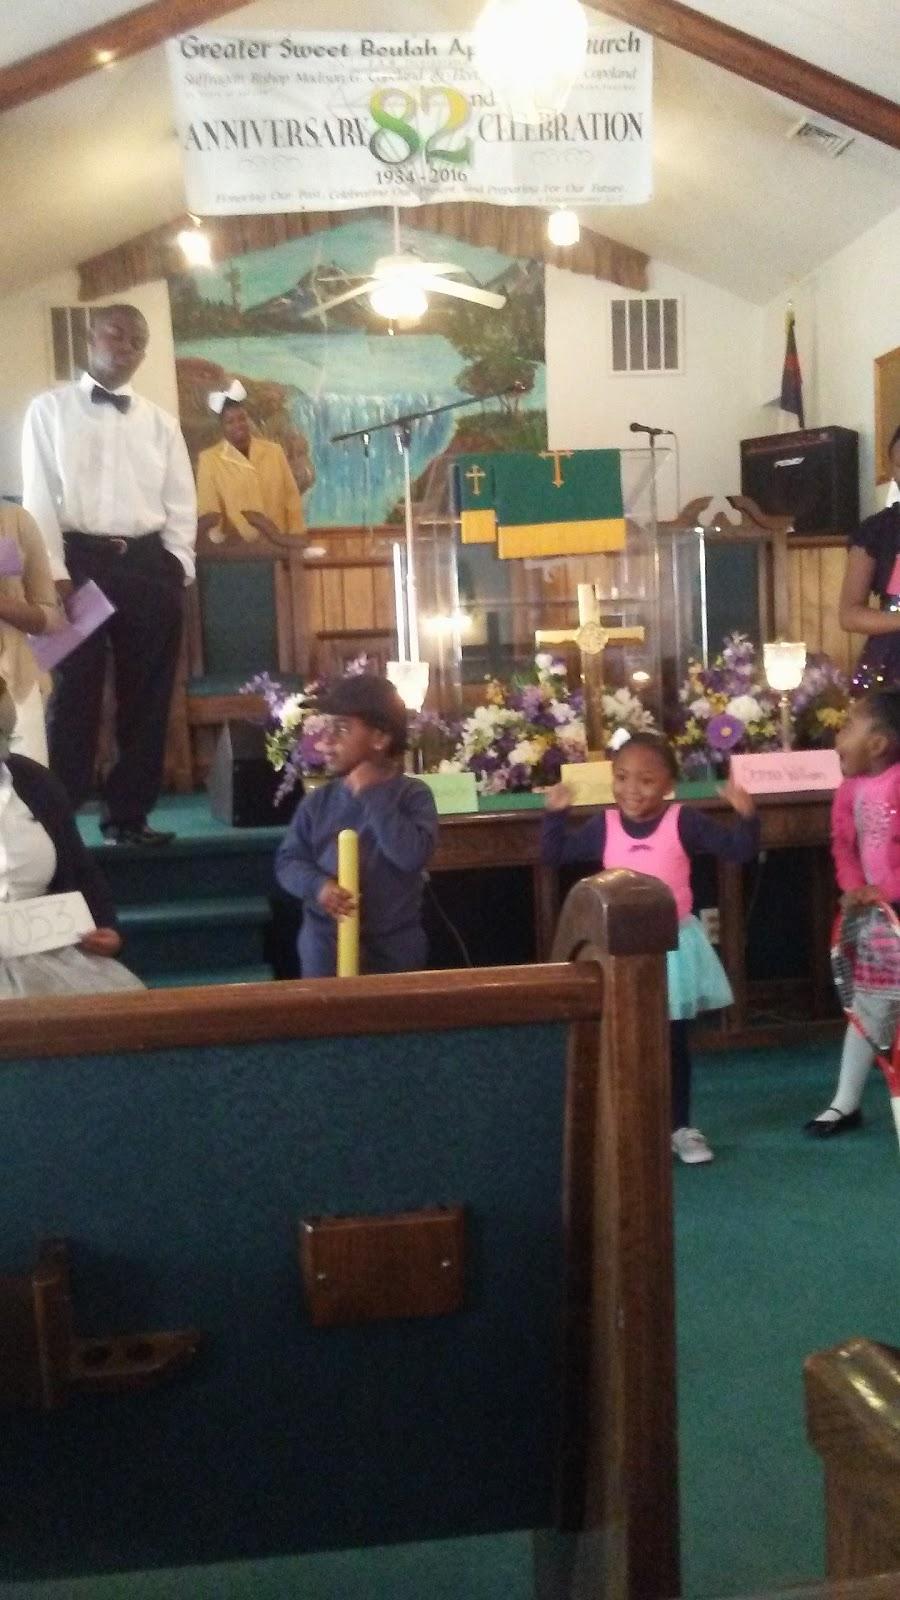 Greater Sweet Beulah Holiness - church  | Photo 1 of 4 | Address: 137 Maple St, Suffolk, VA 23434, USA | Phone: (757) 539-9535